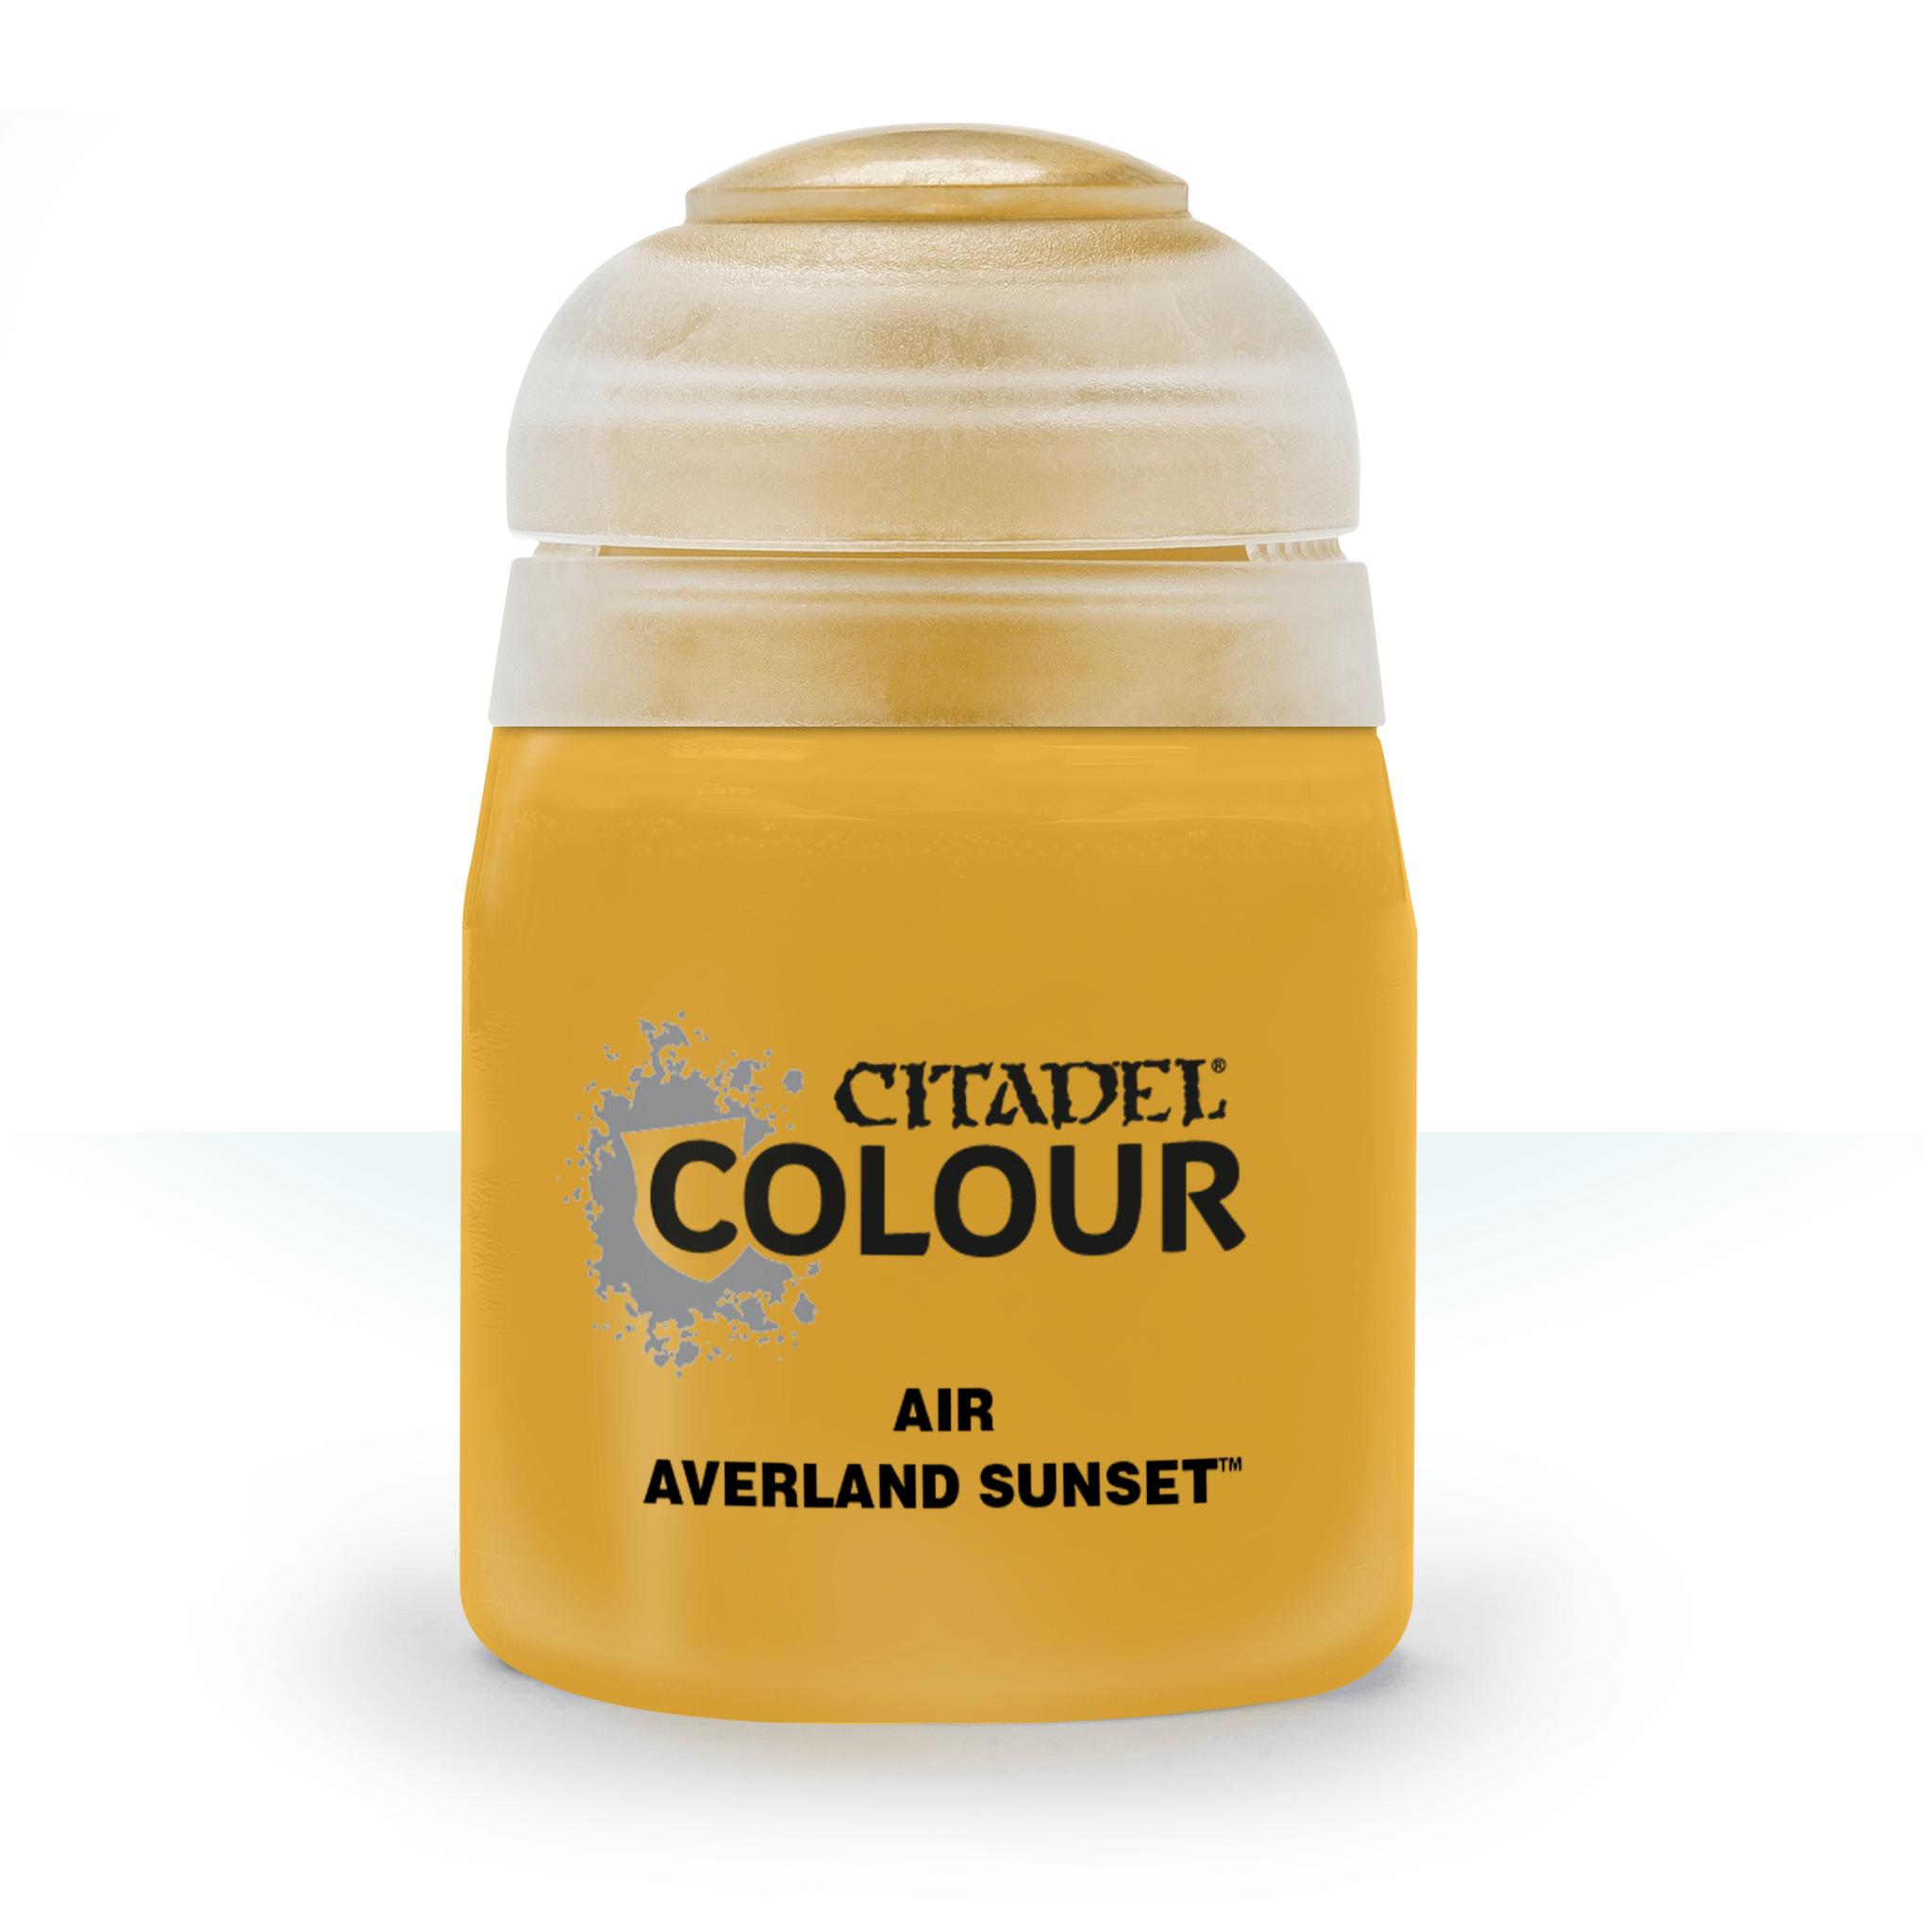 Averland Sunset (Air)